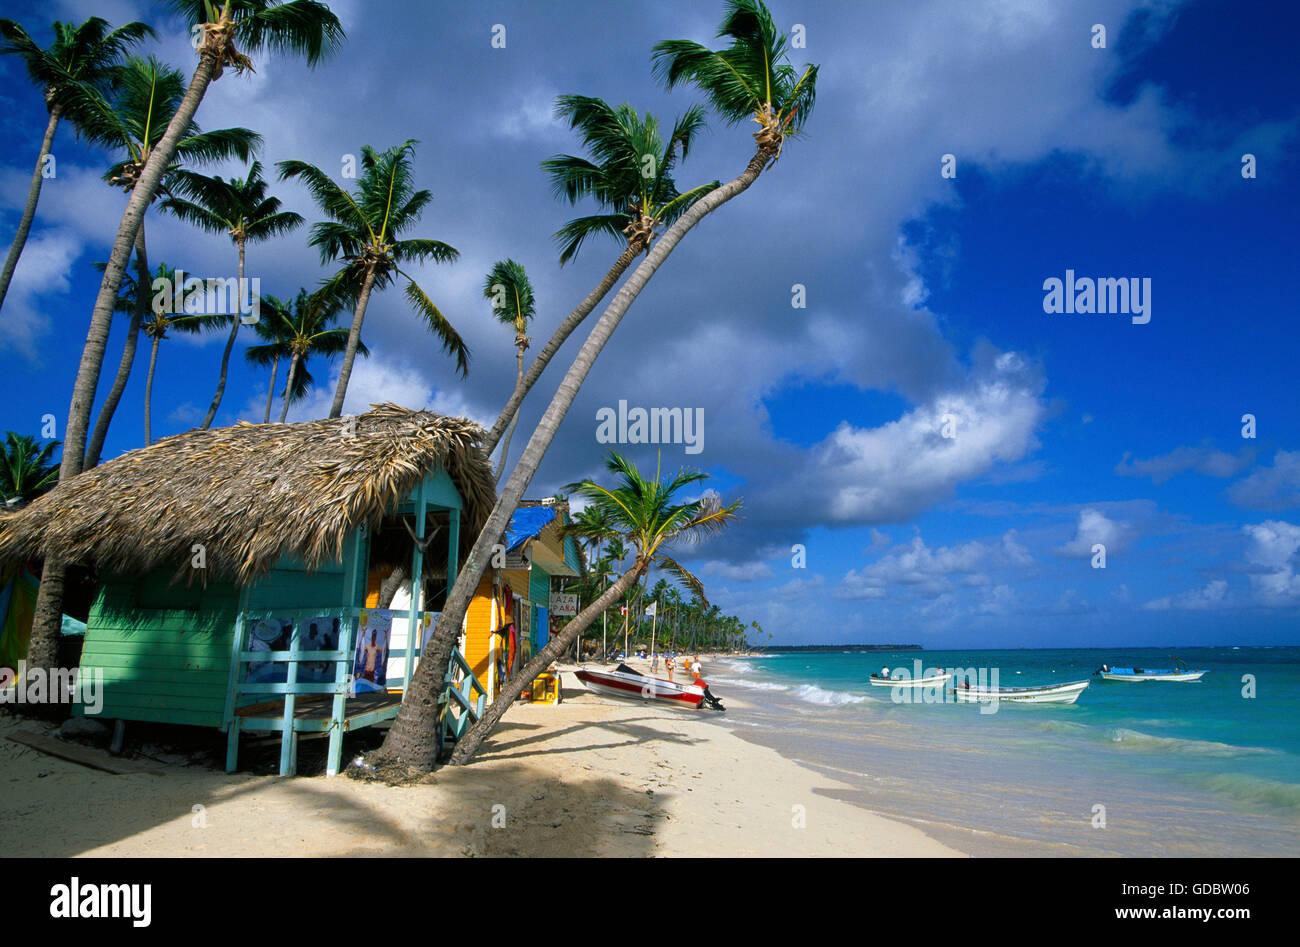 Blue Beach Punta Cana For Sale